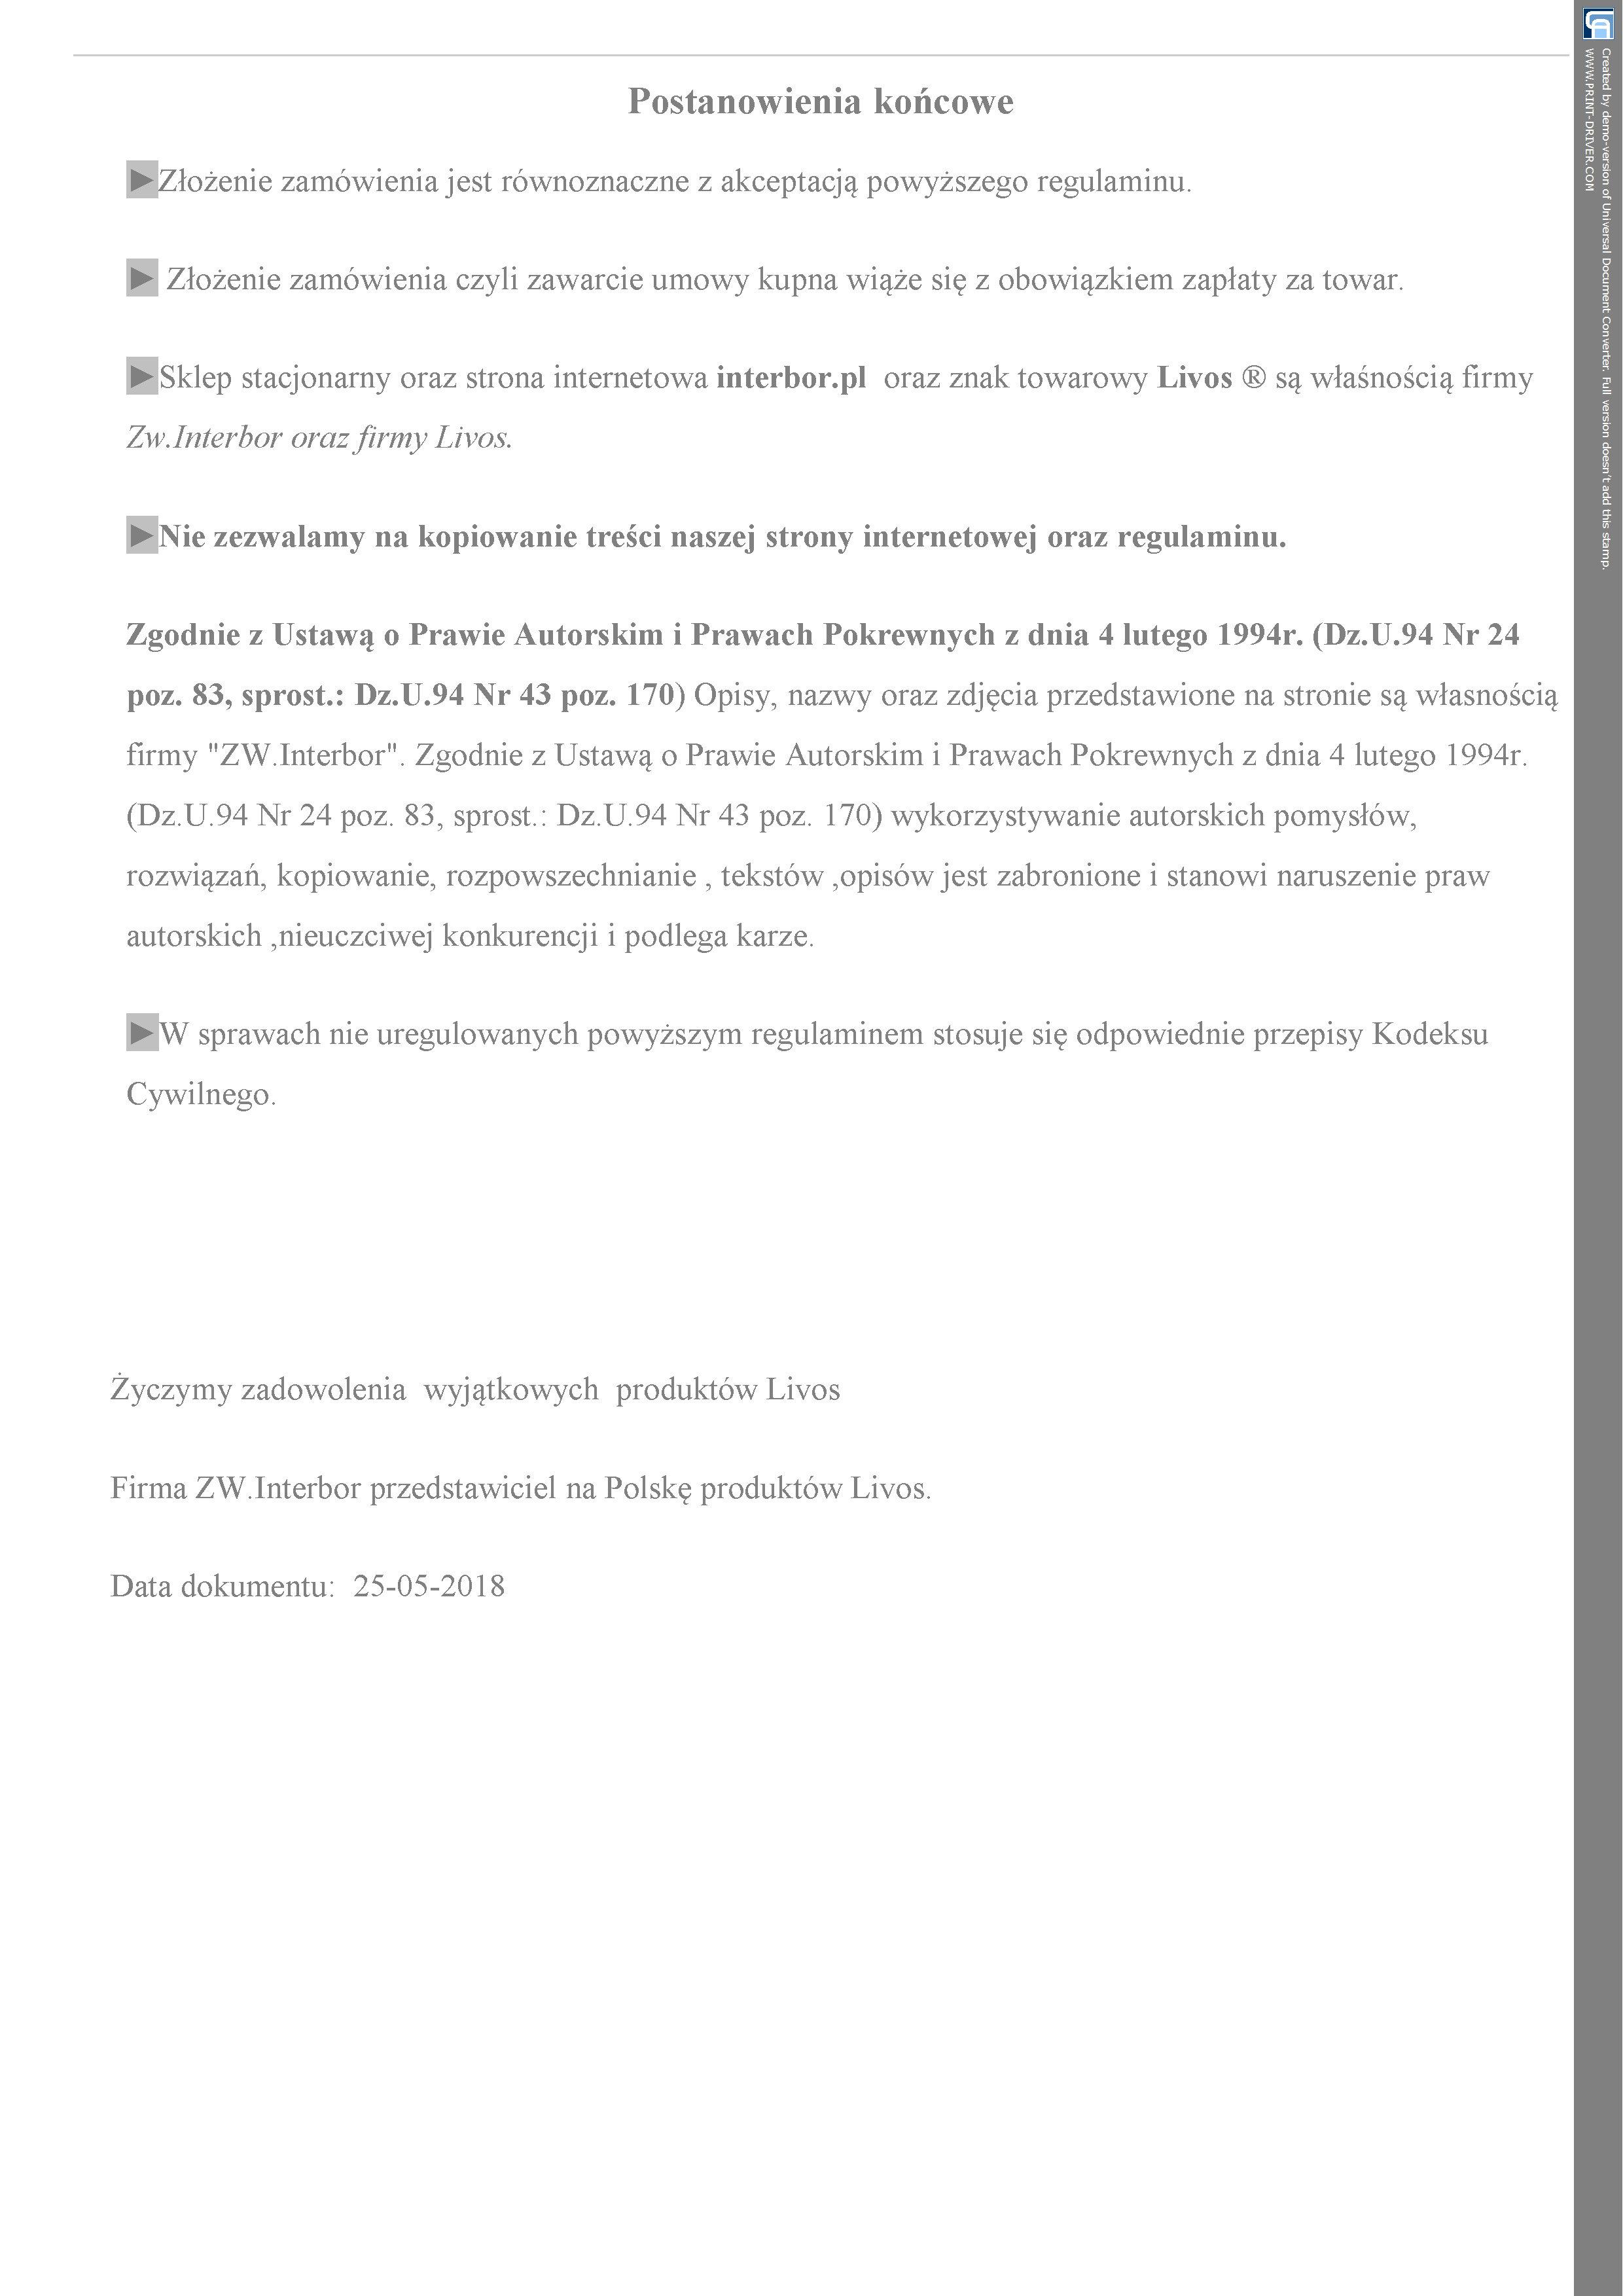 Regulamin zakupw 25 maj 20184jpg 5 str wwwjpg